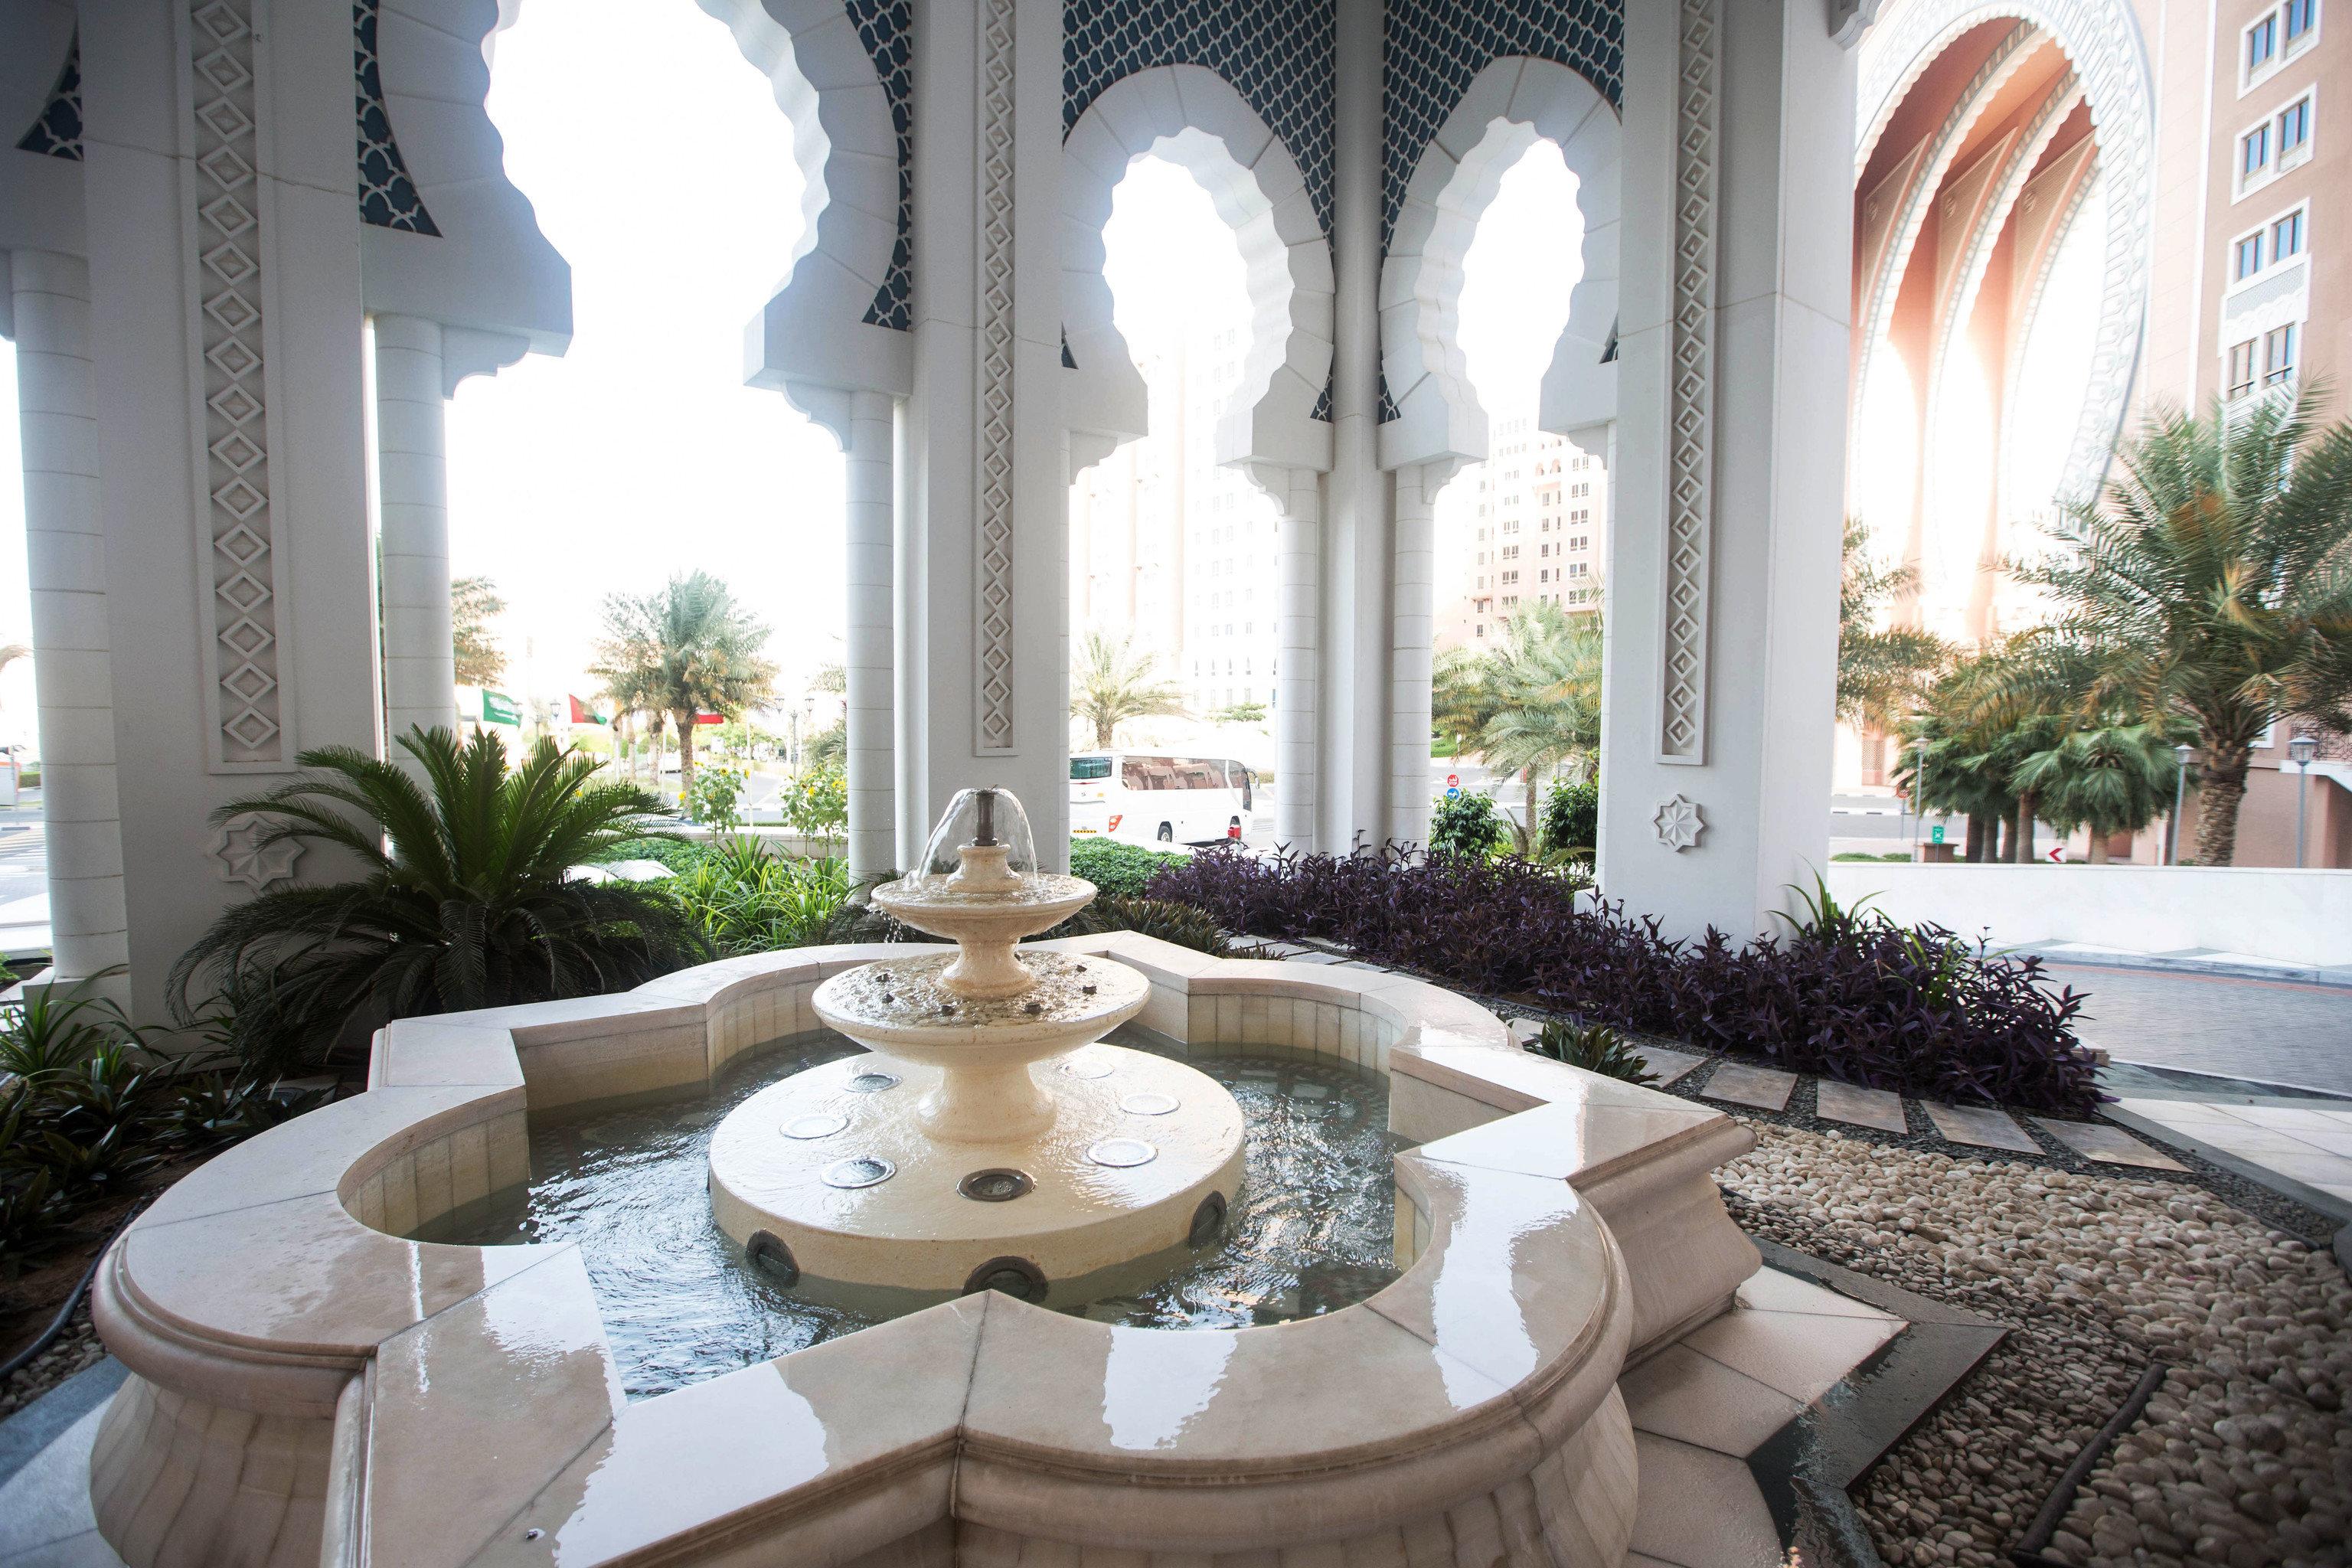 property mansion home Villa Courtyard hacienda palace living room court stone Garden arch colonnade